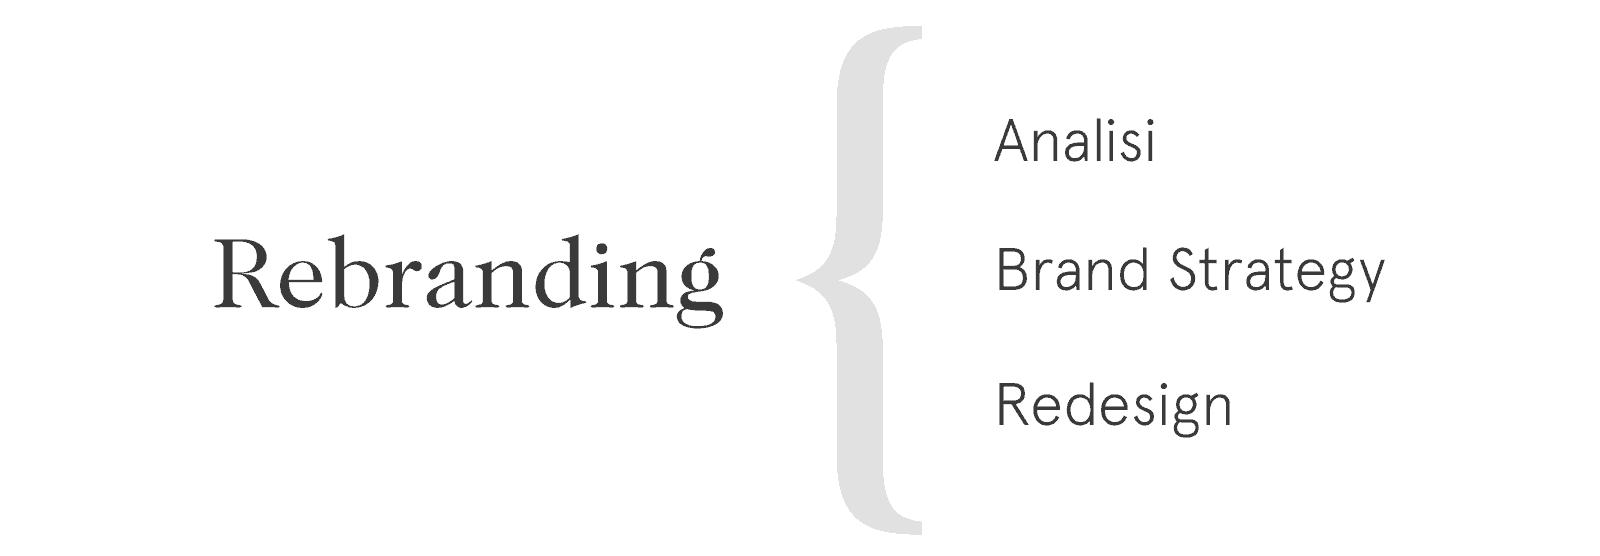 fasi del rebranding